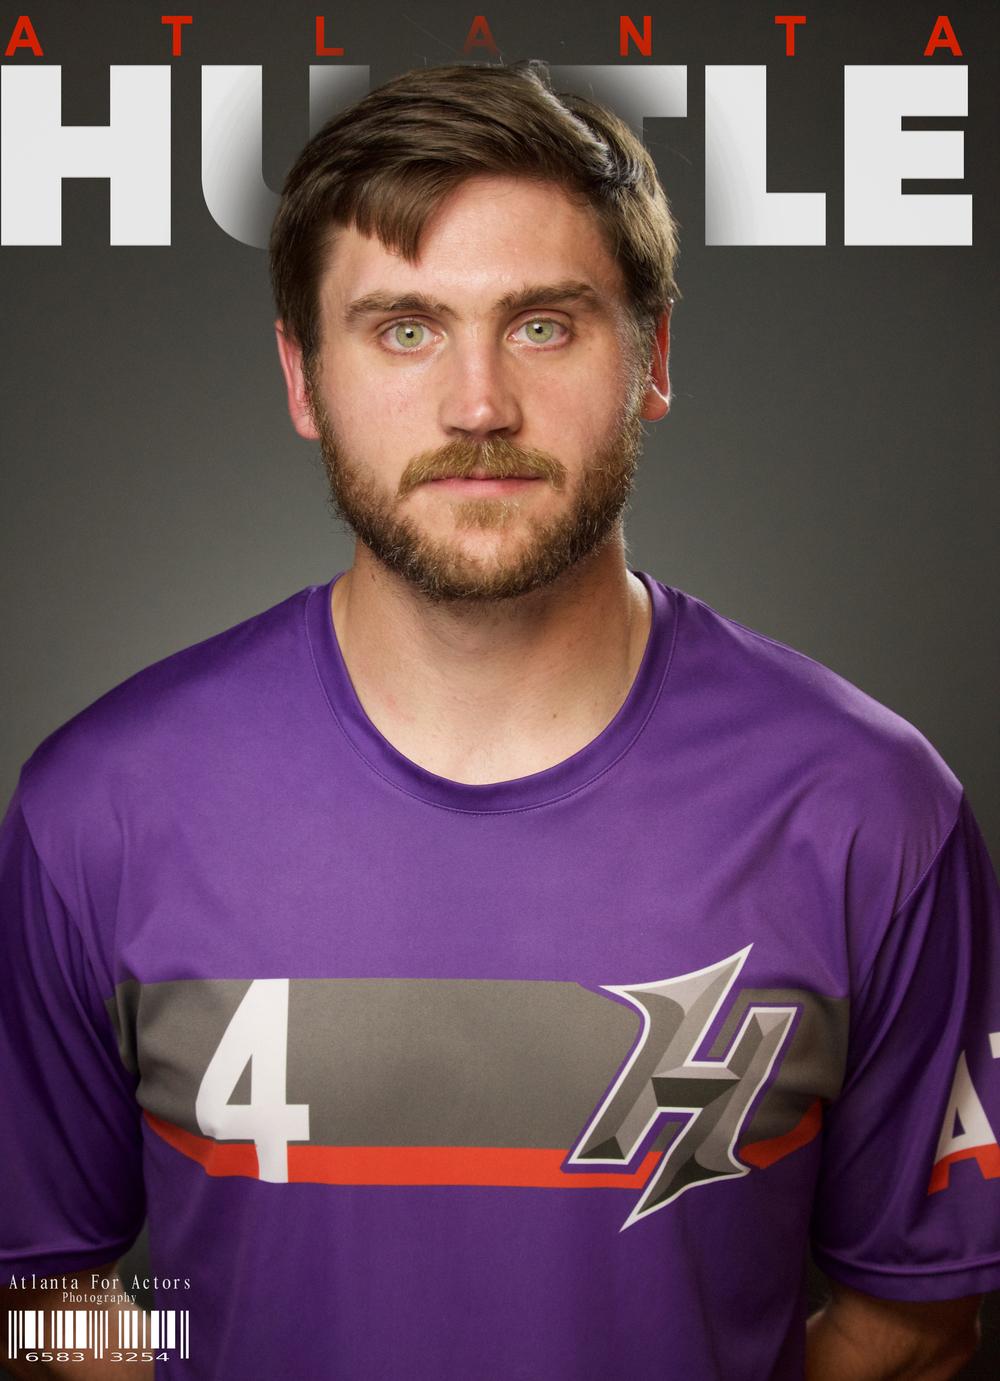 #4 | Ryan Archibald